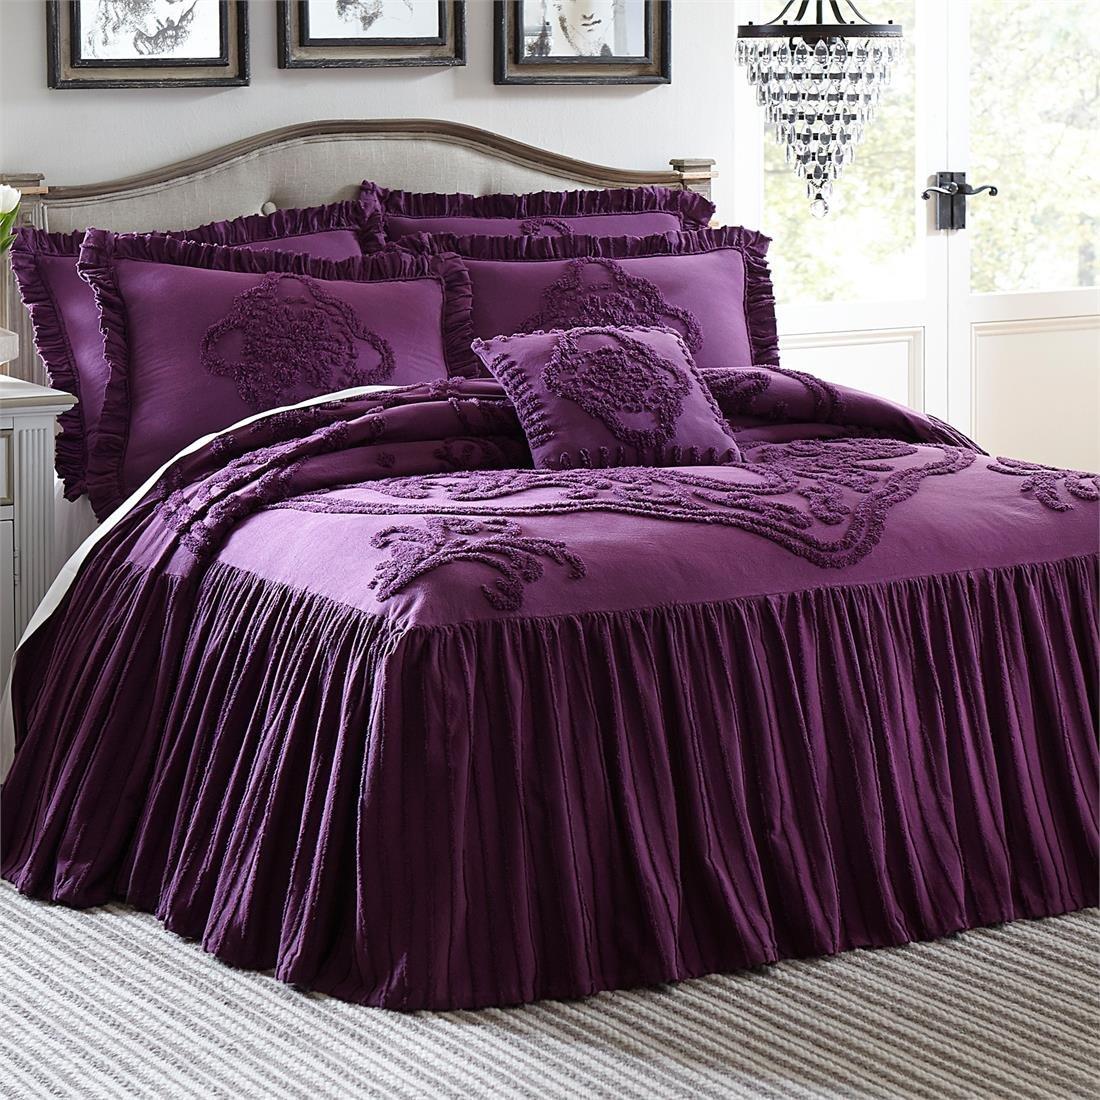 grey purple bedding queen and sets comforter plum cheap set size eggplant